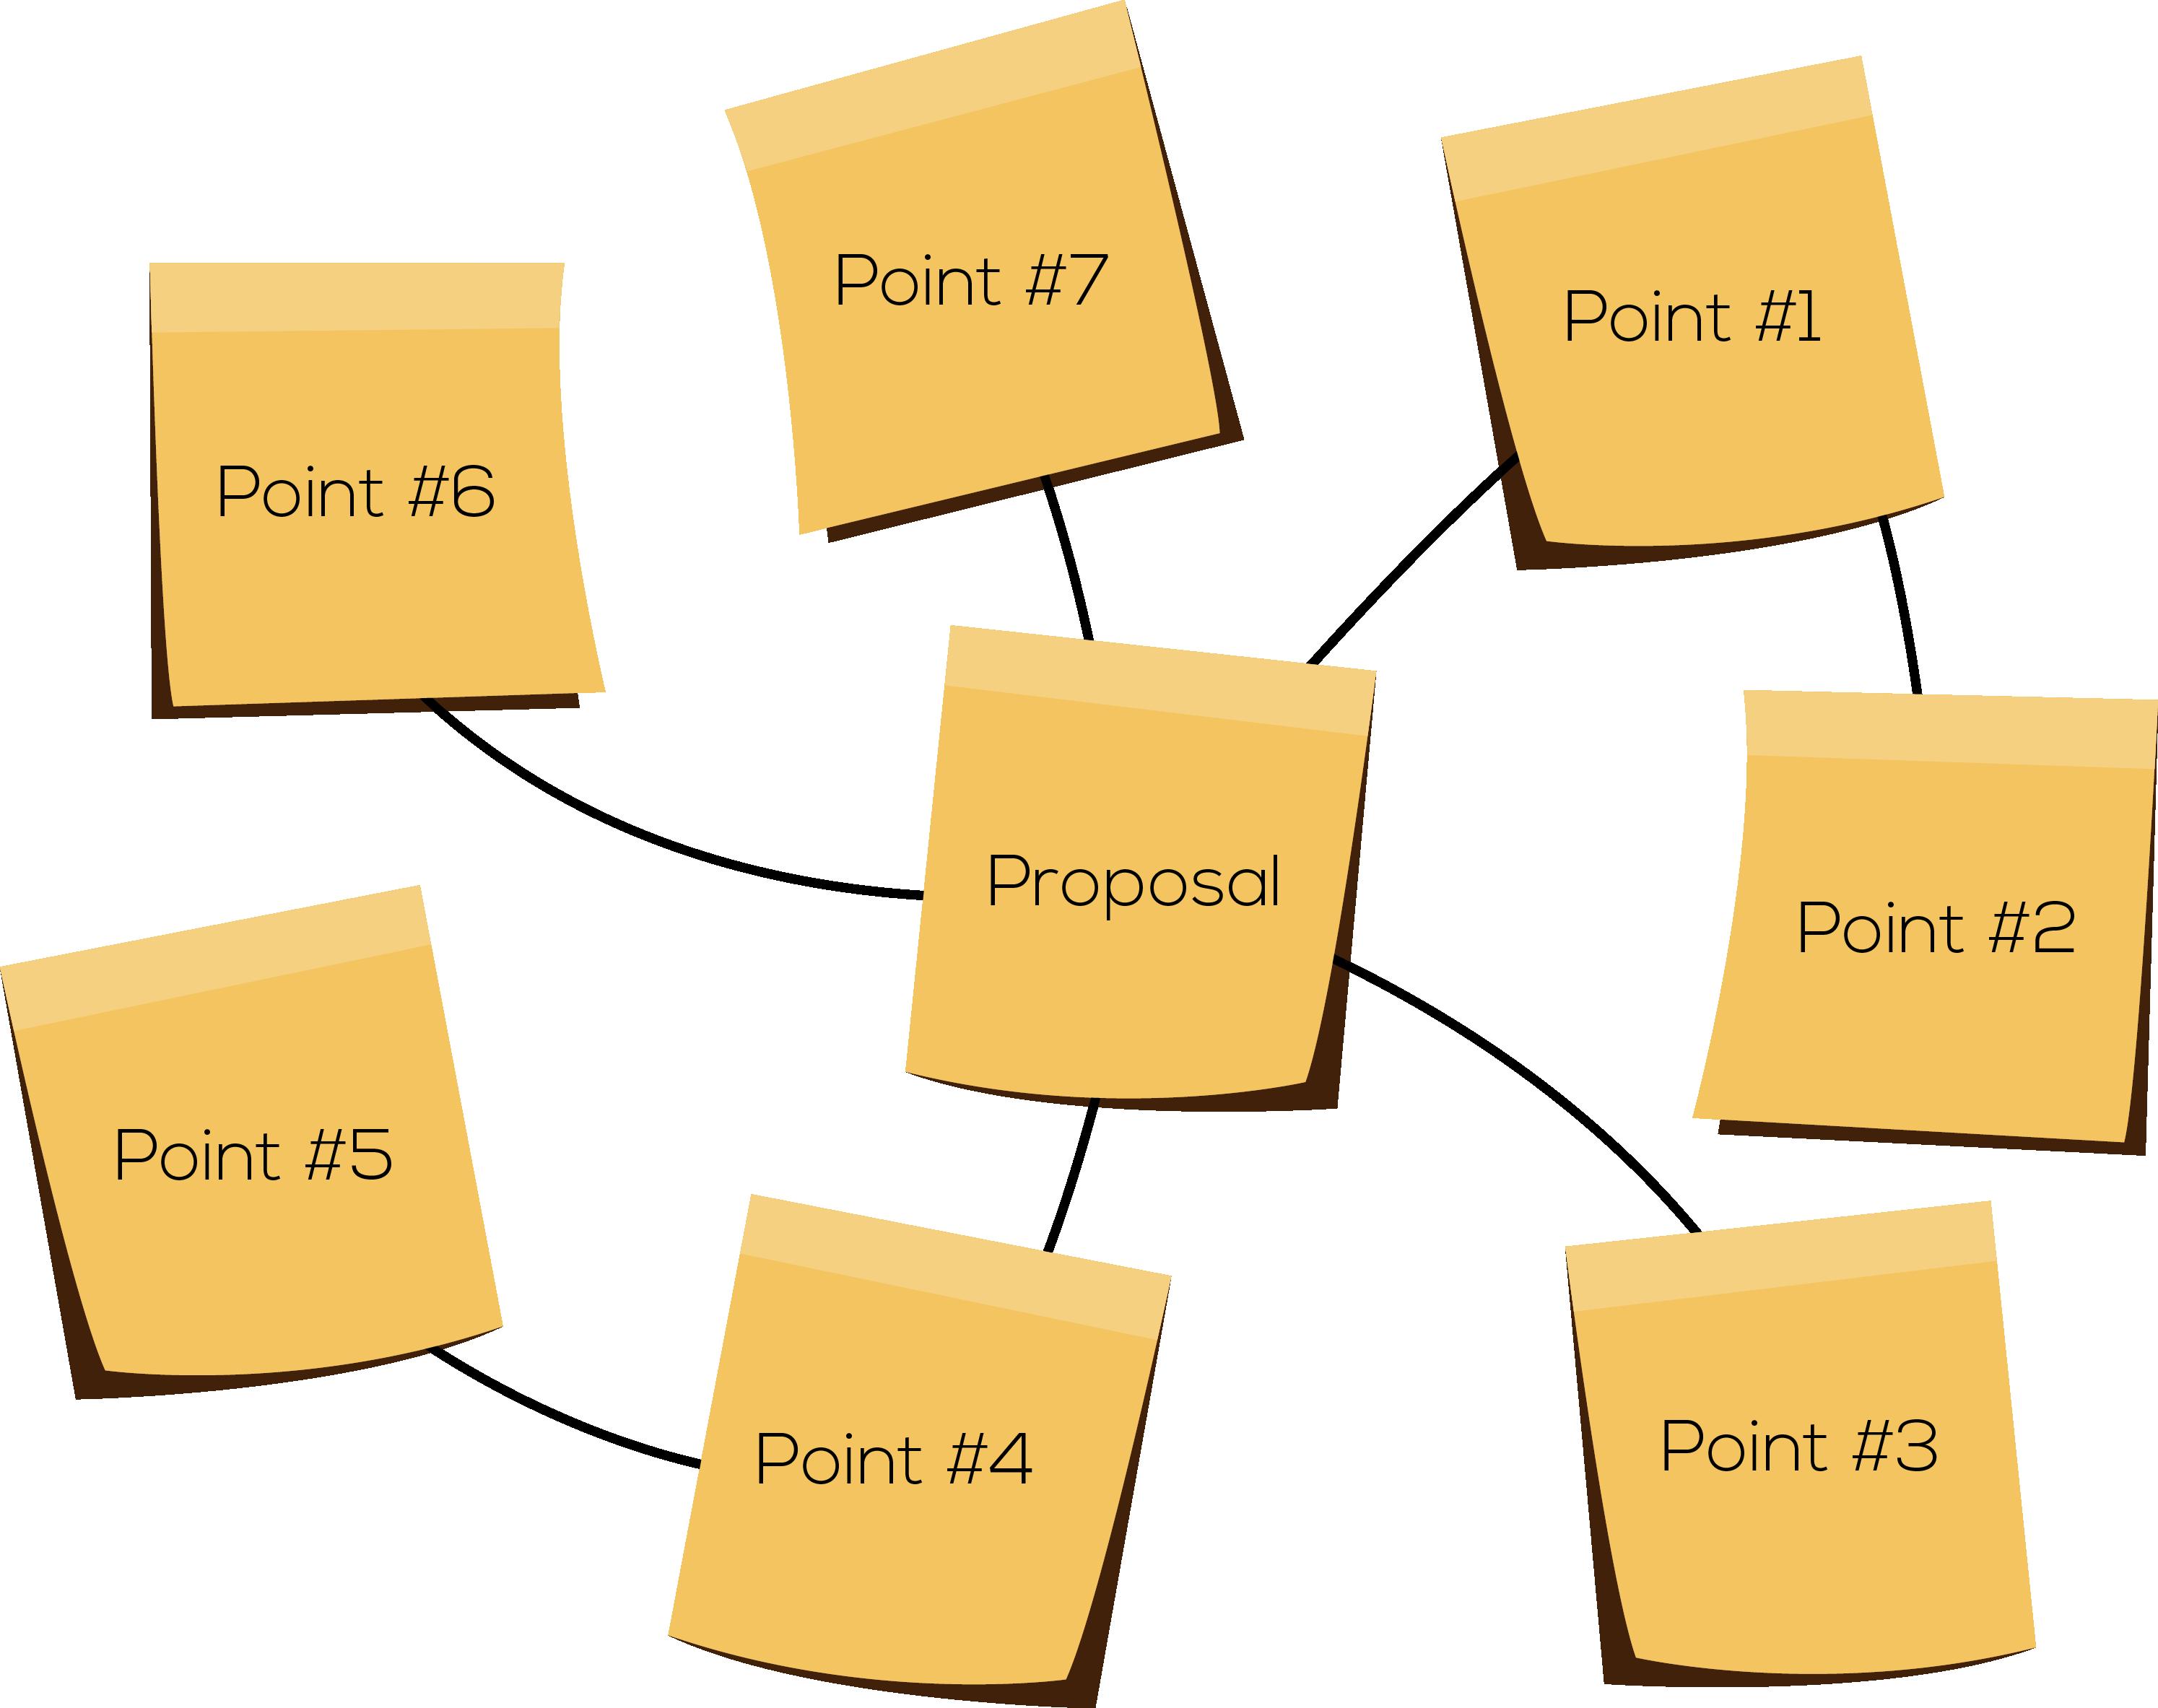 Proposal sticky note surrounded by point sticky notes